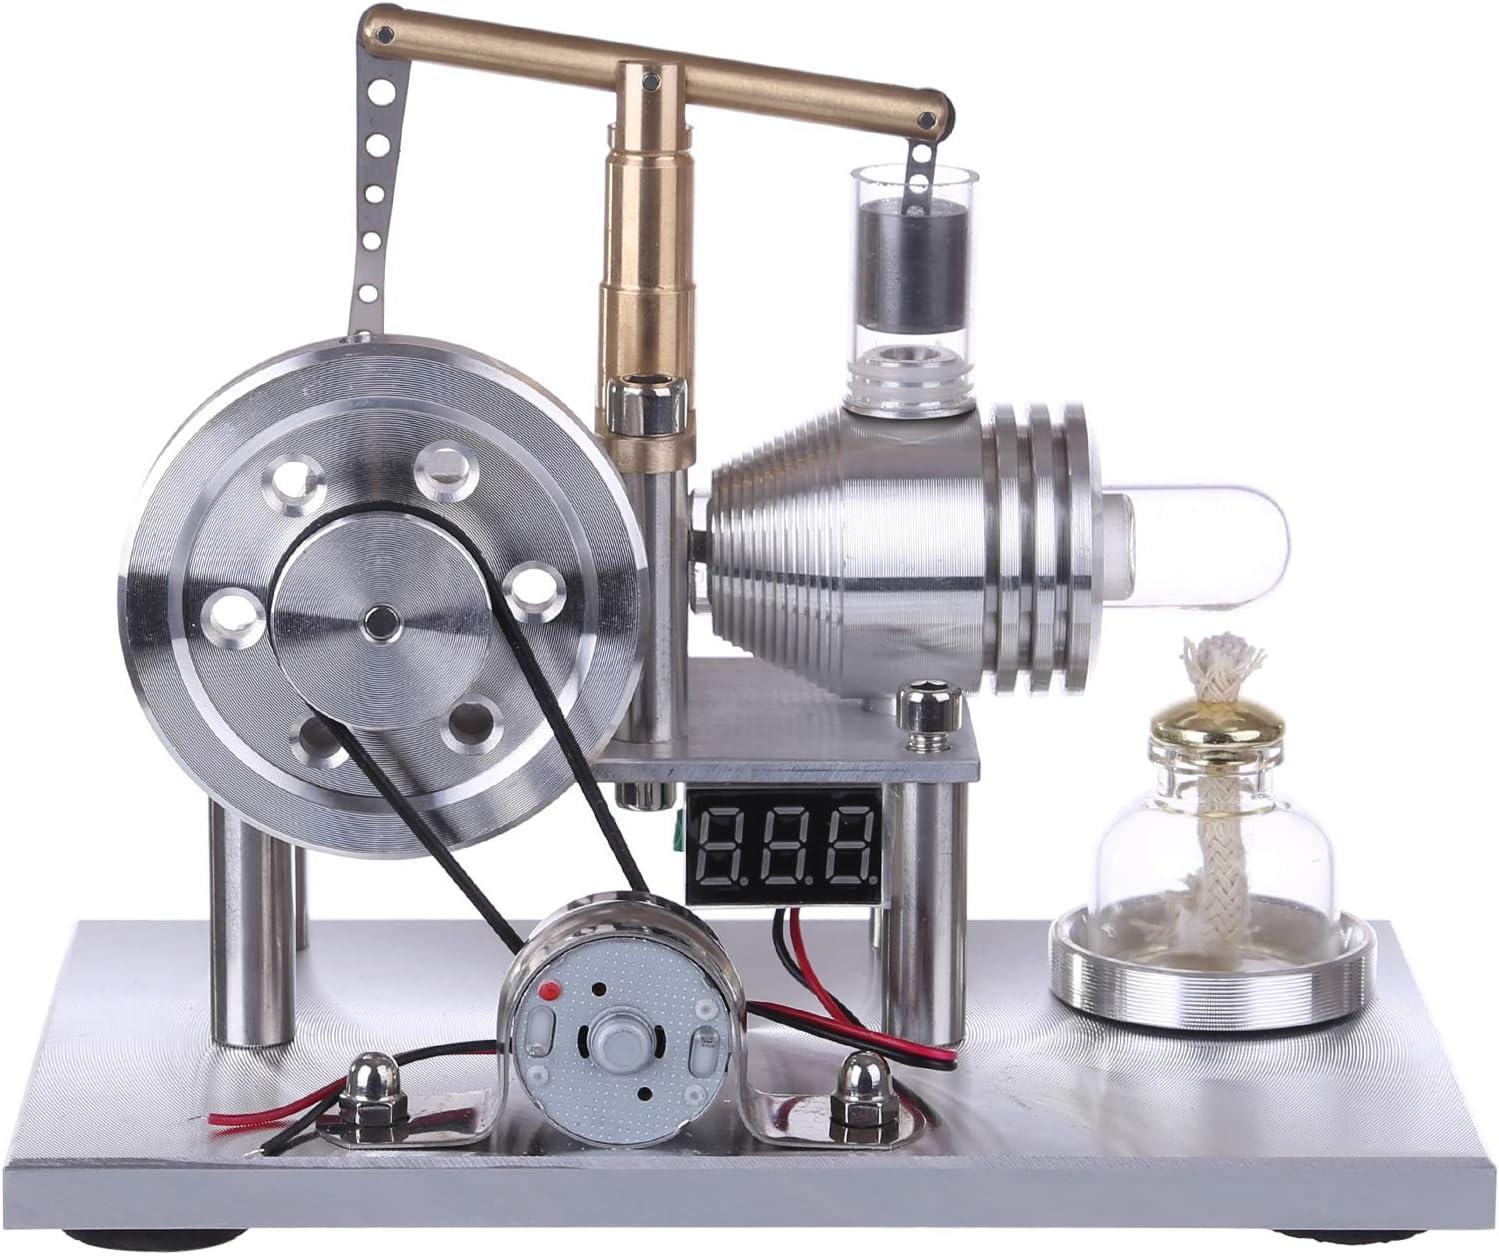 deguojilvxingshe Modell Stirling Motoren Balance Typ Hei/ßluft Stirling Motor Generator Modell Wissenschaft Lernspielzeug f/ür Erwachsene und Kinder